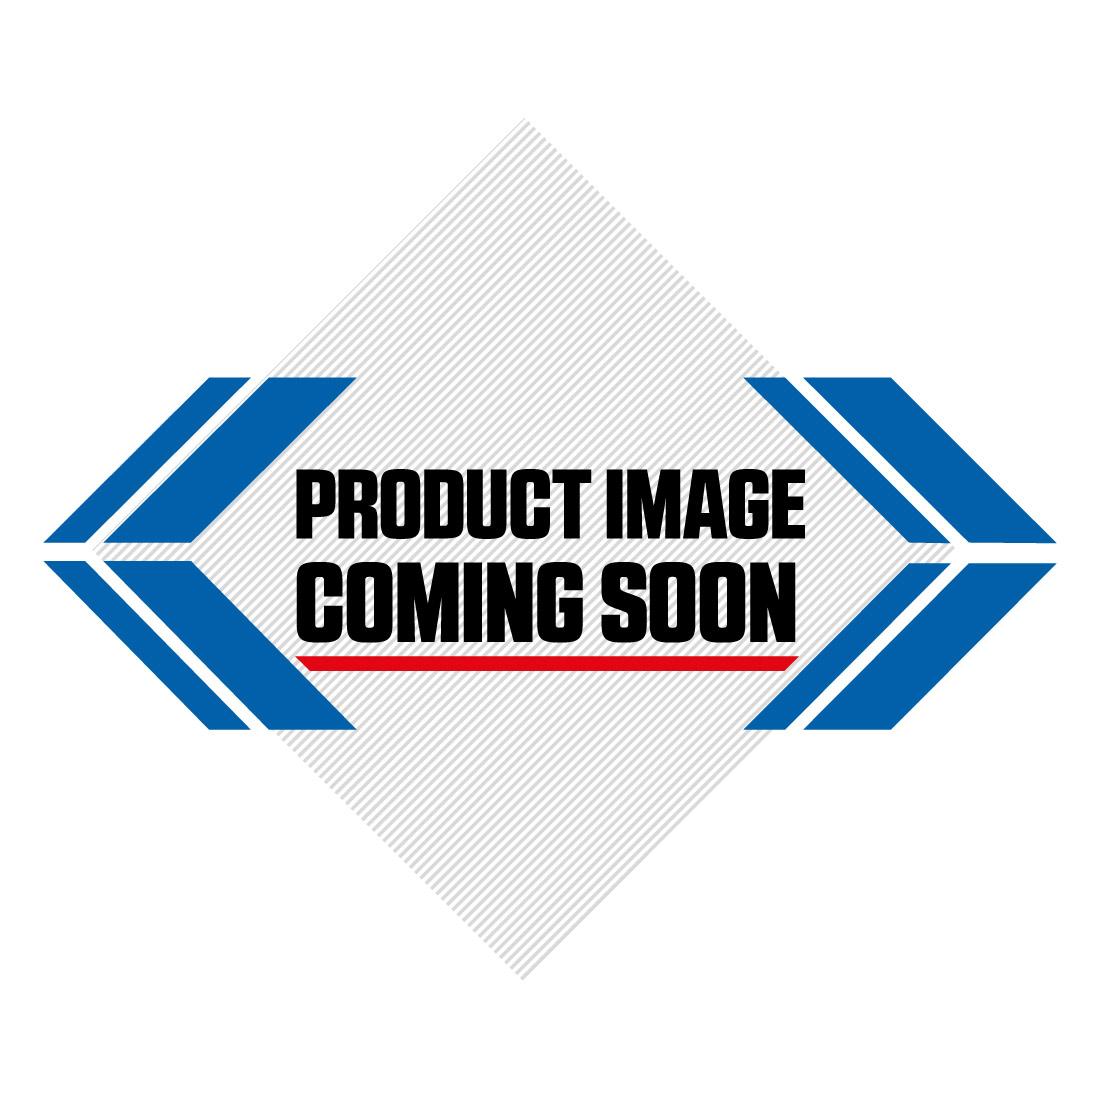 Silkolene Comp 4 10w-40 XP Ester Based Semi Synthetic Bike Engine Oil - 4 Cube Image-4>